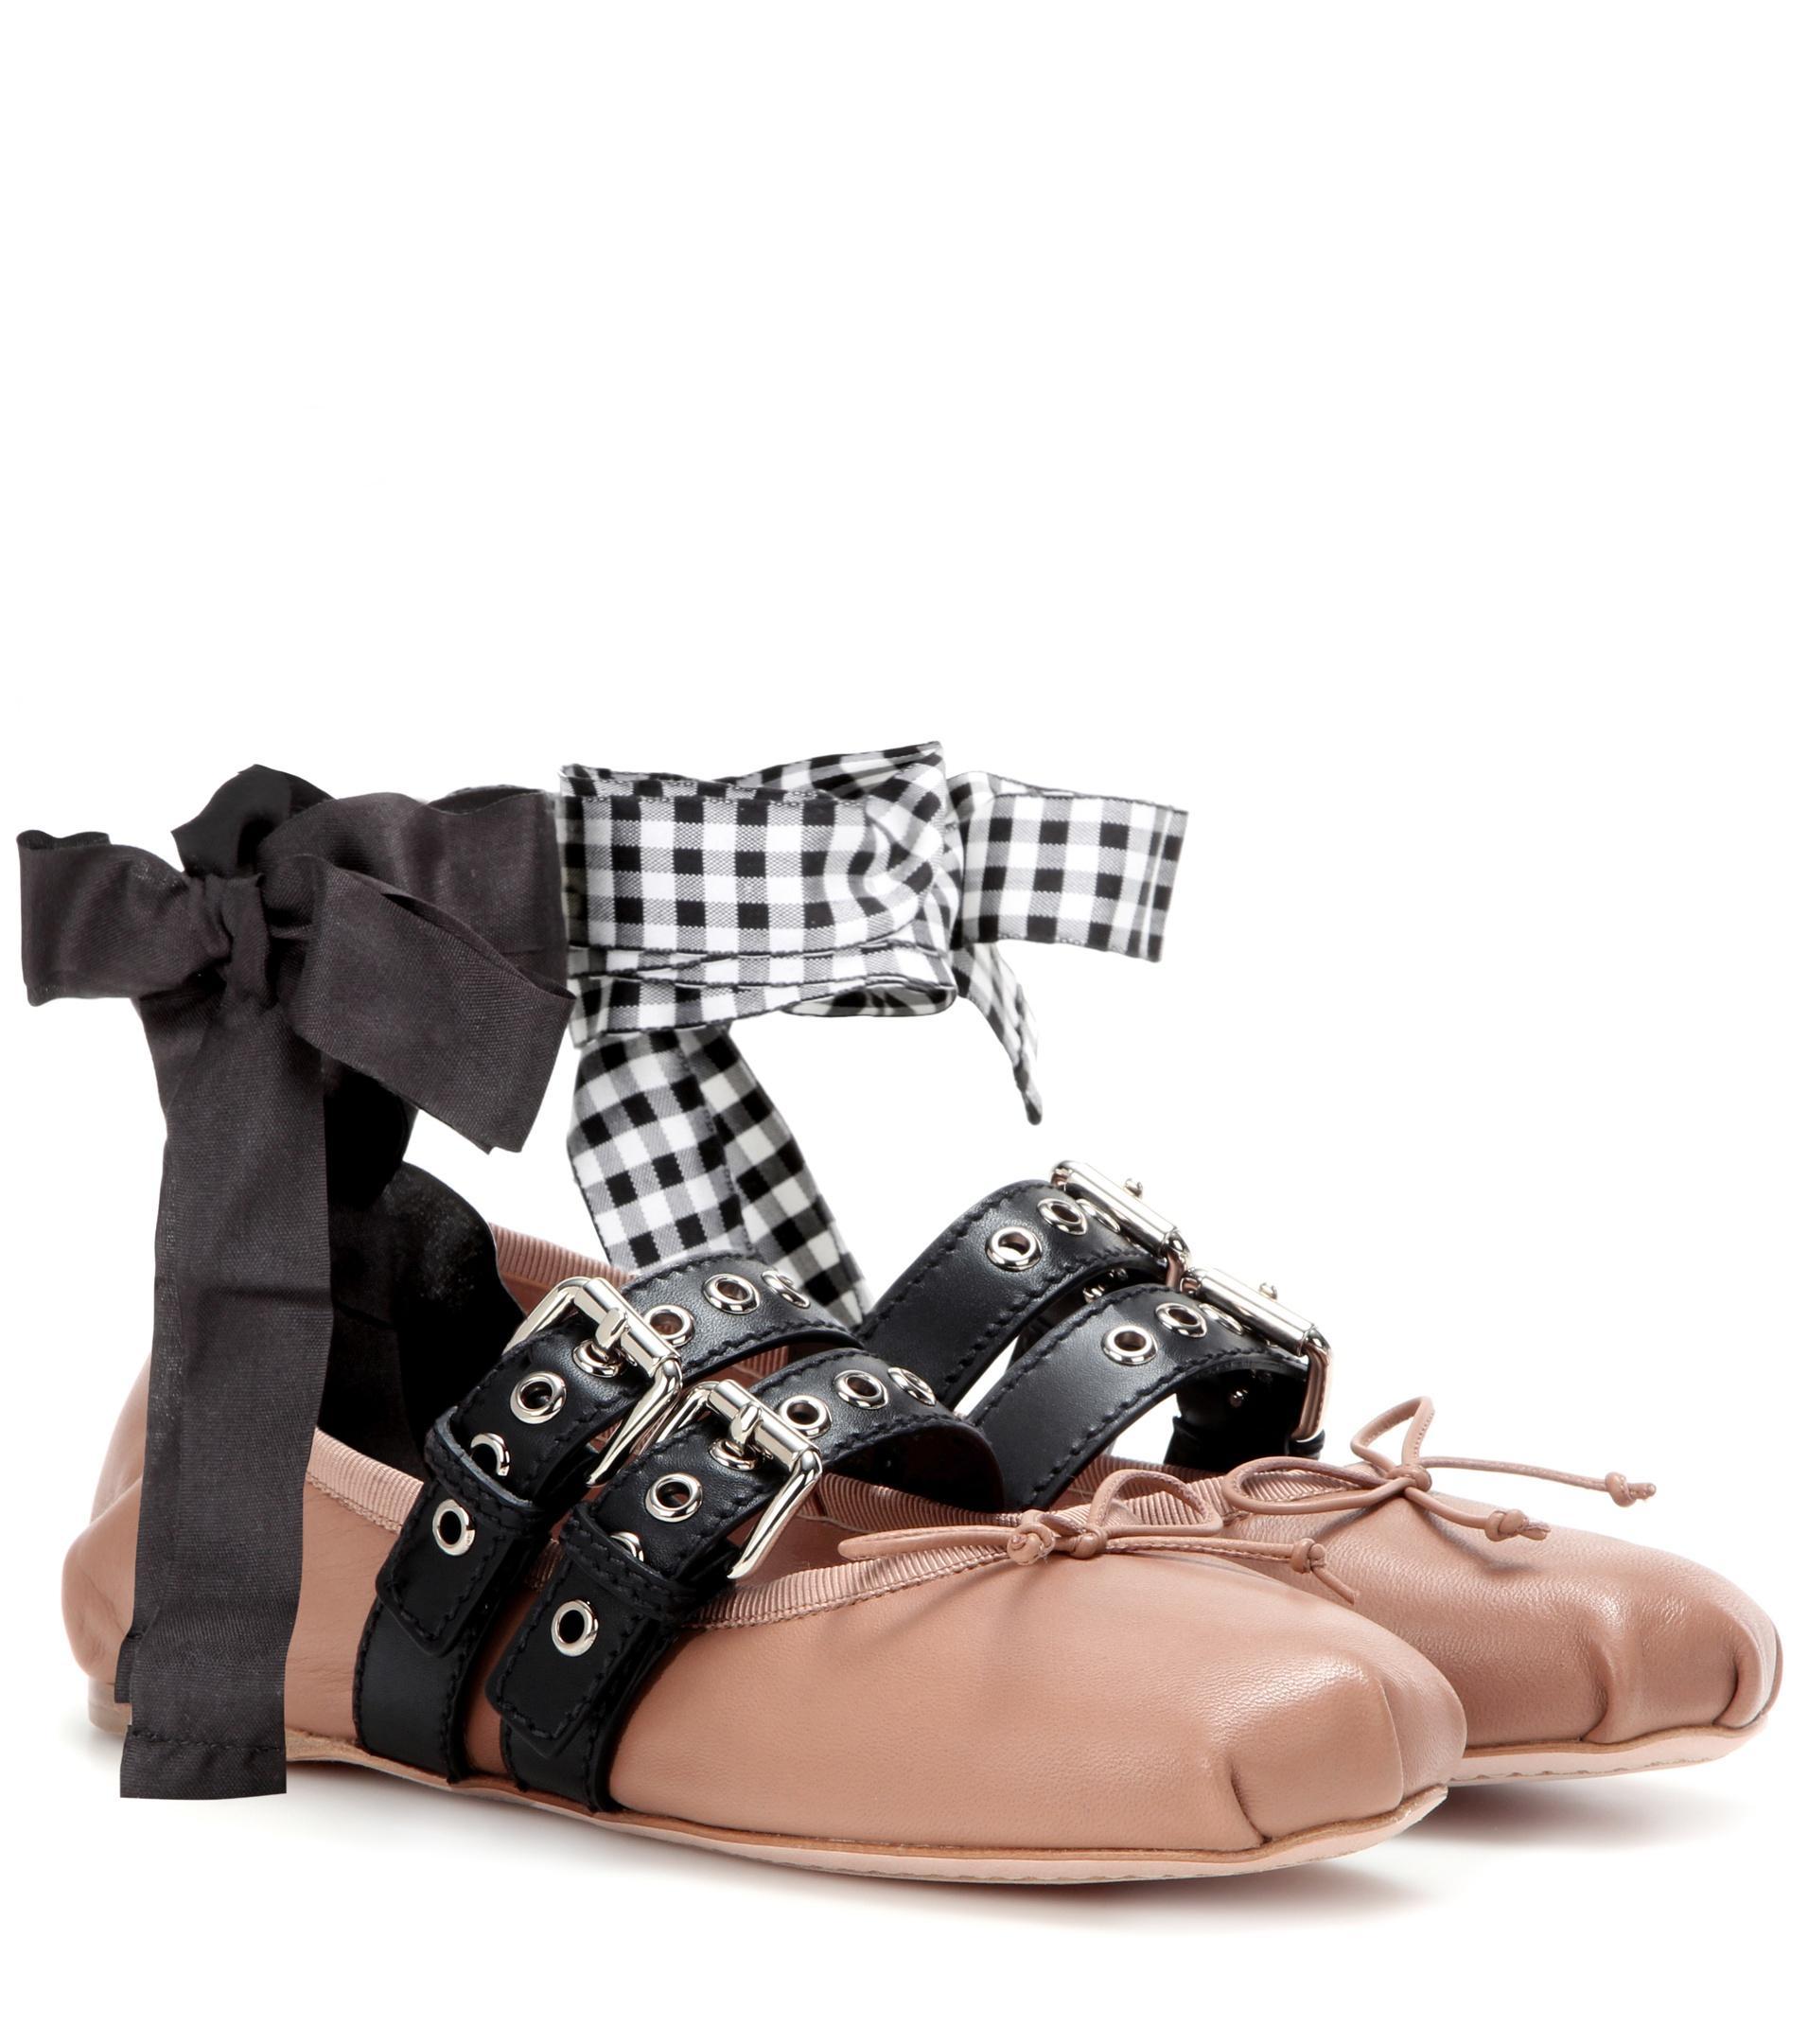 miu miu buckle embellished leather ballerinas in natural lyst. Black Bedroom Furniture Sets. Home Design Ideas